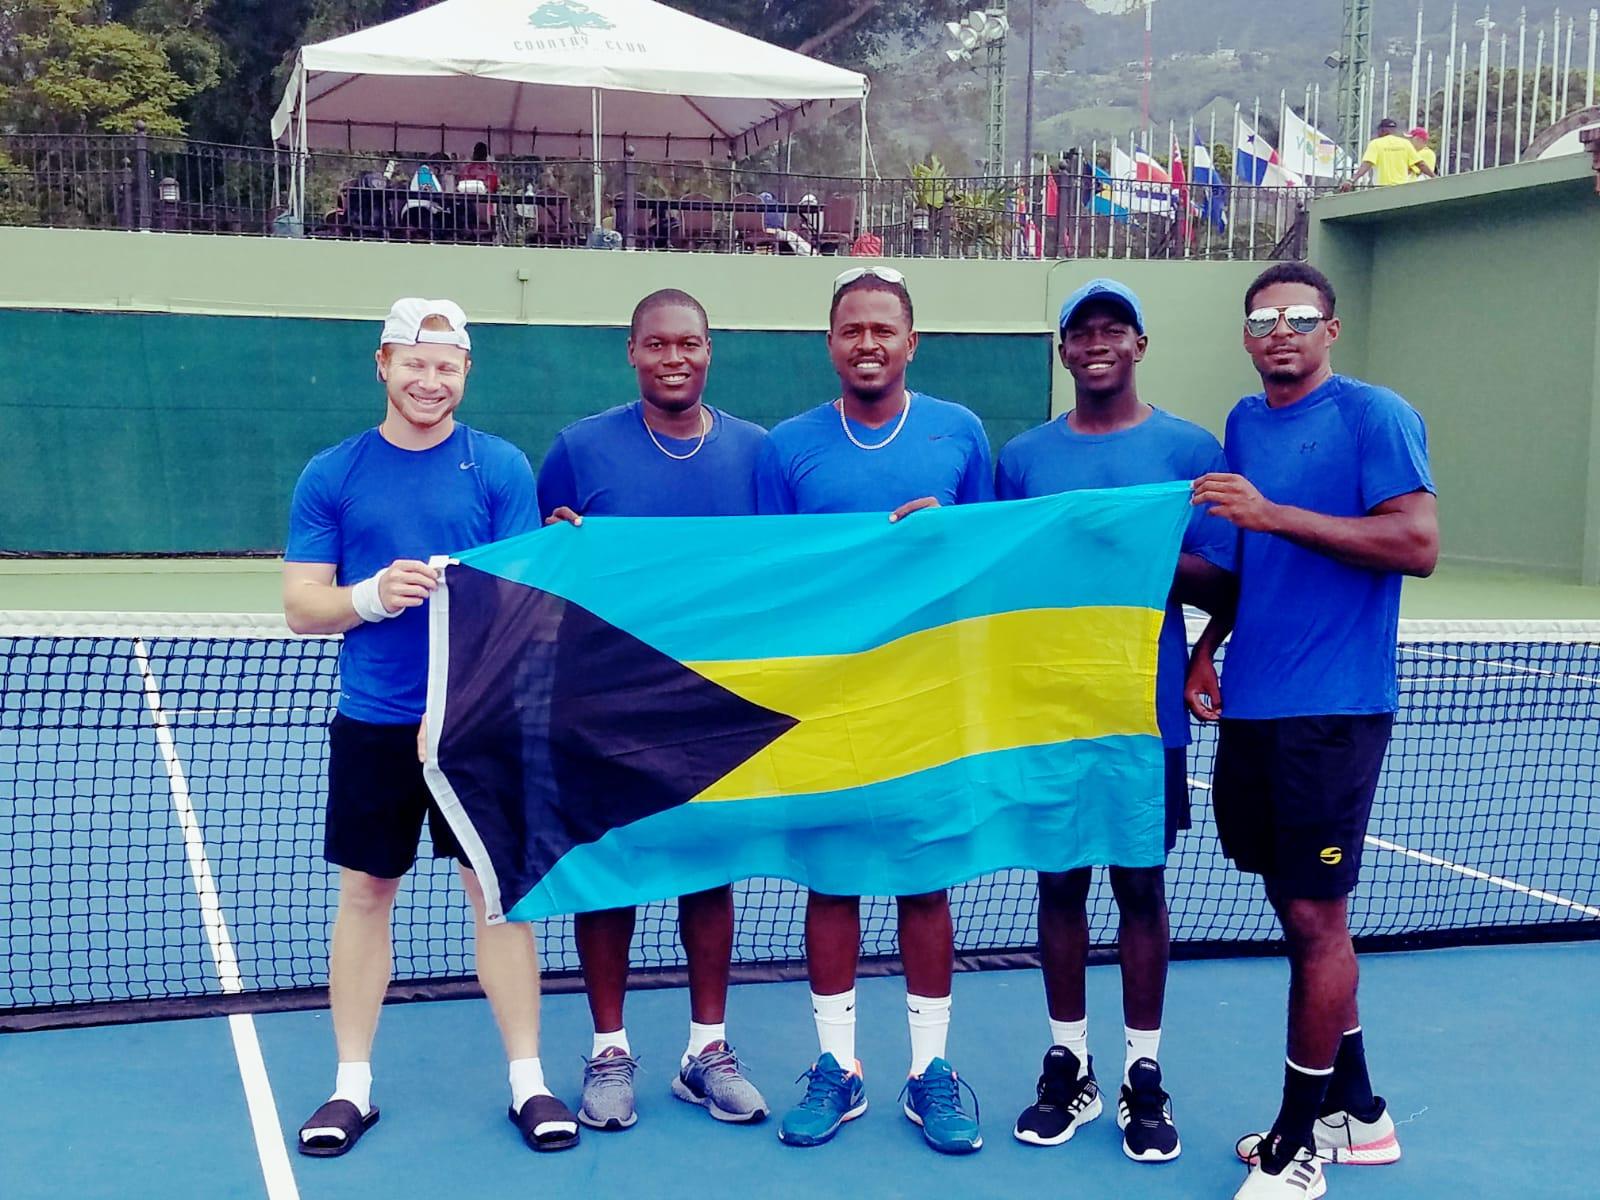 Bahamas picks up Davis Cup win over Antigua and Barbuda